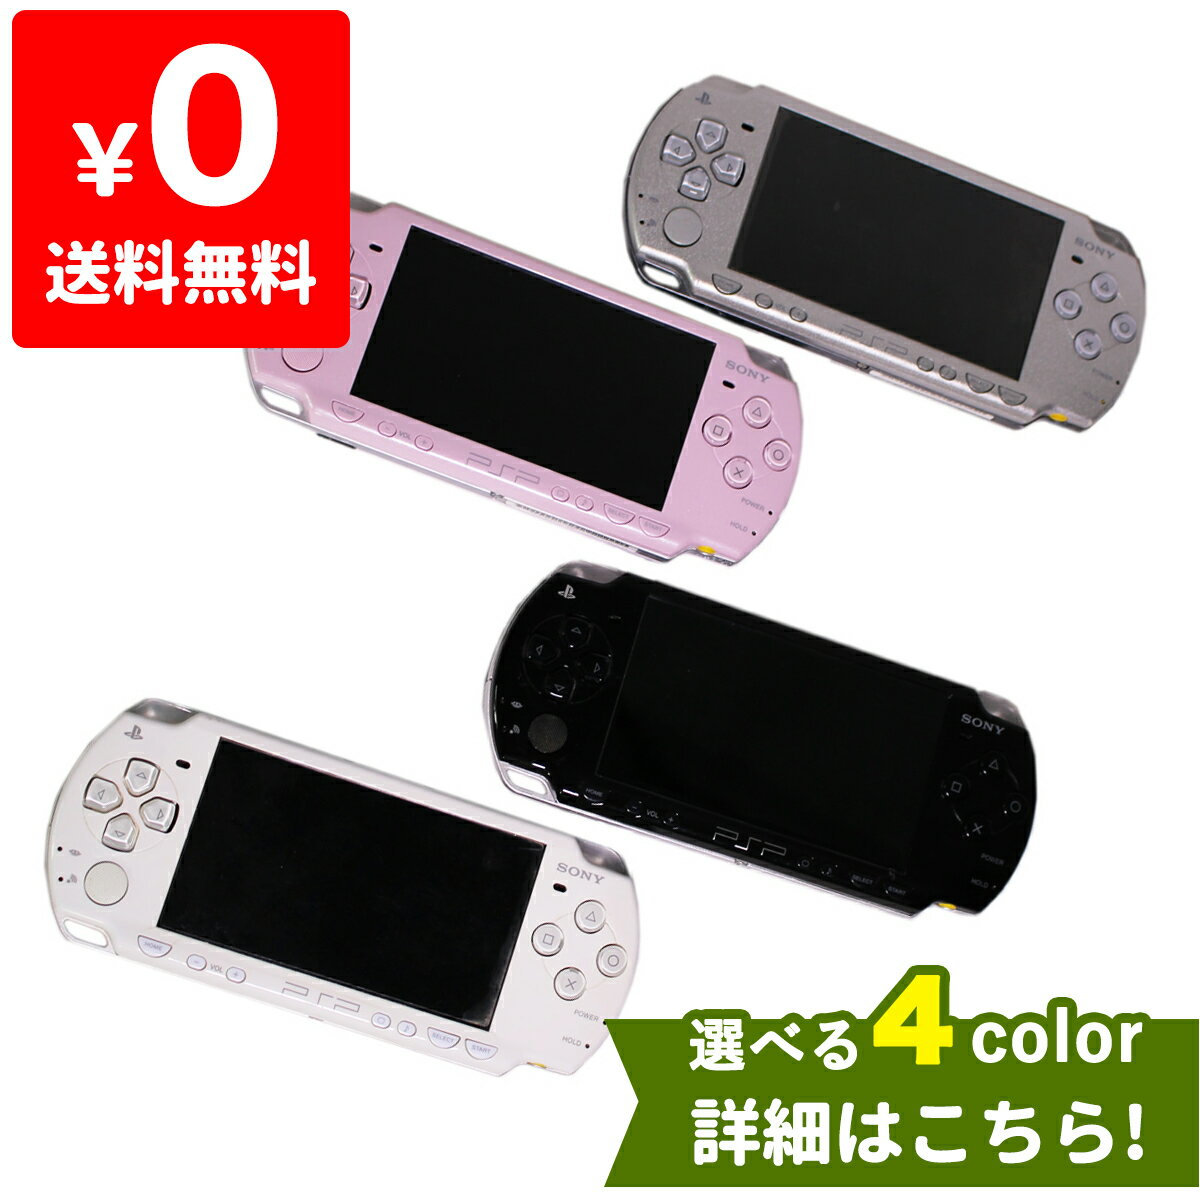 PSP-2000 プレイステーション・ポータブル 本体 すぐ遊べるセット 選べる4色 PlayStationPortable SONY ソニー 中古 4948872411417 送料無料